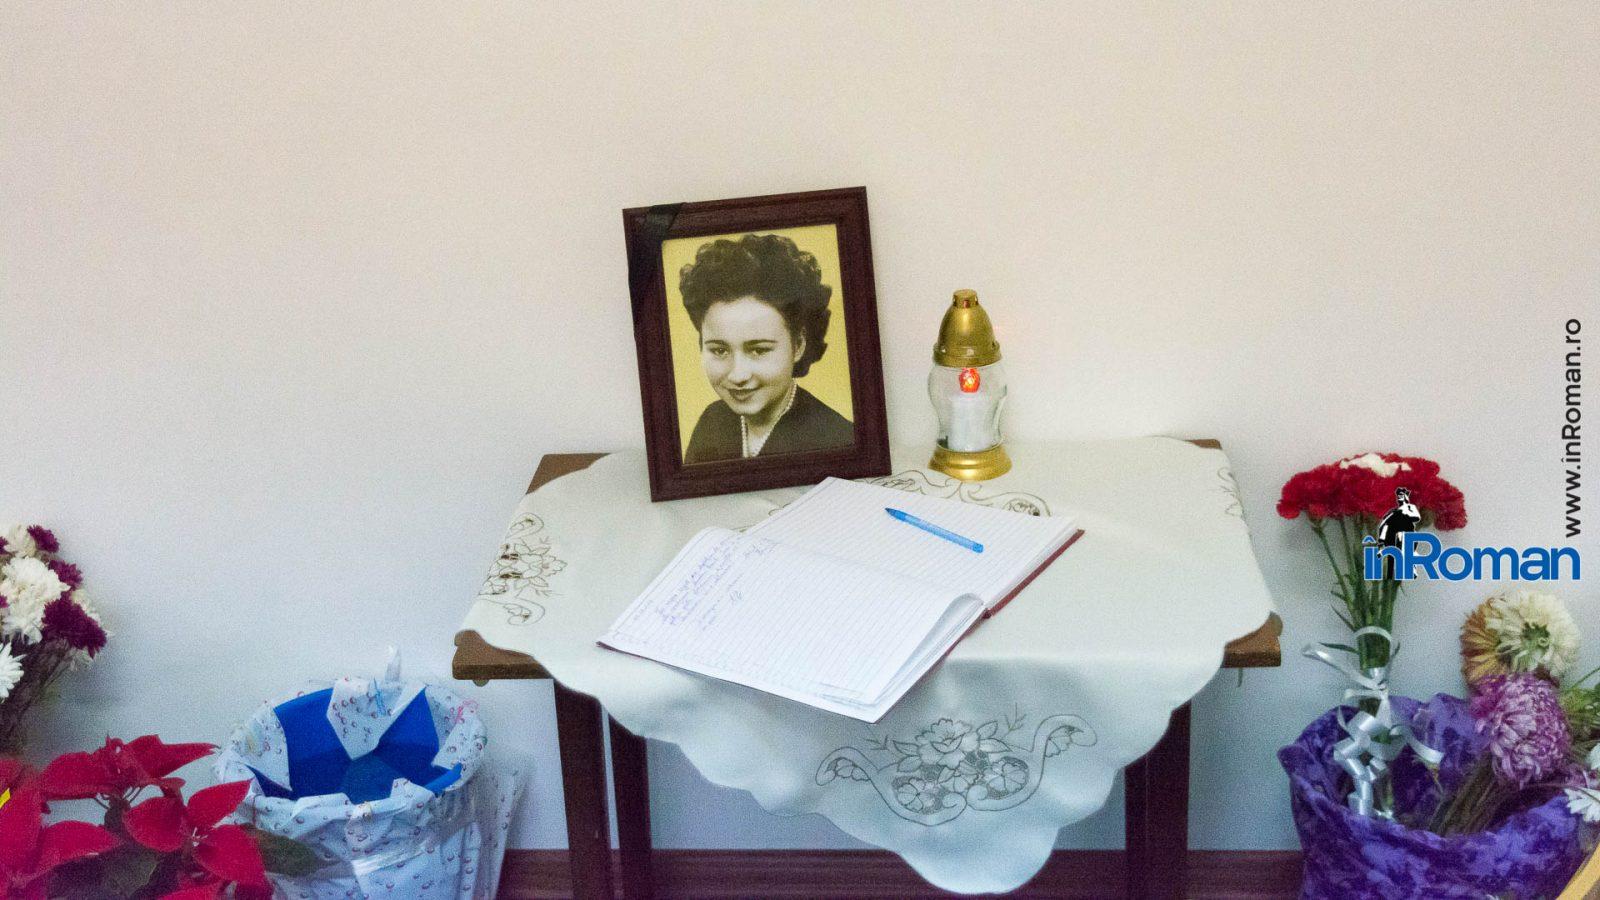 Cartea in care sute de oameni au lasat un mesaj in amintirea Minodorei Ursachi / sursa foto: inroman.ro